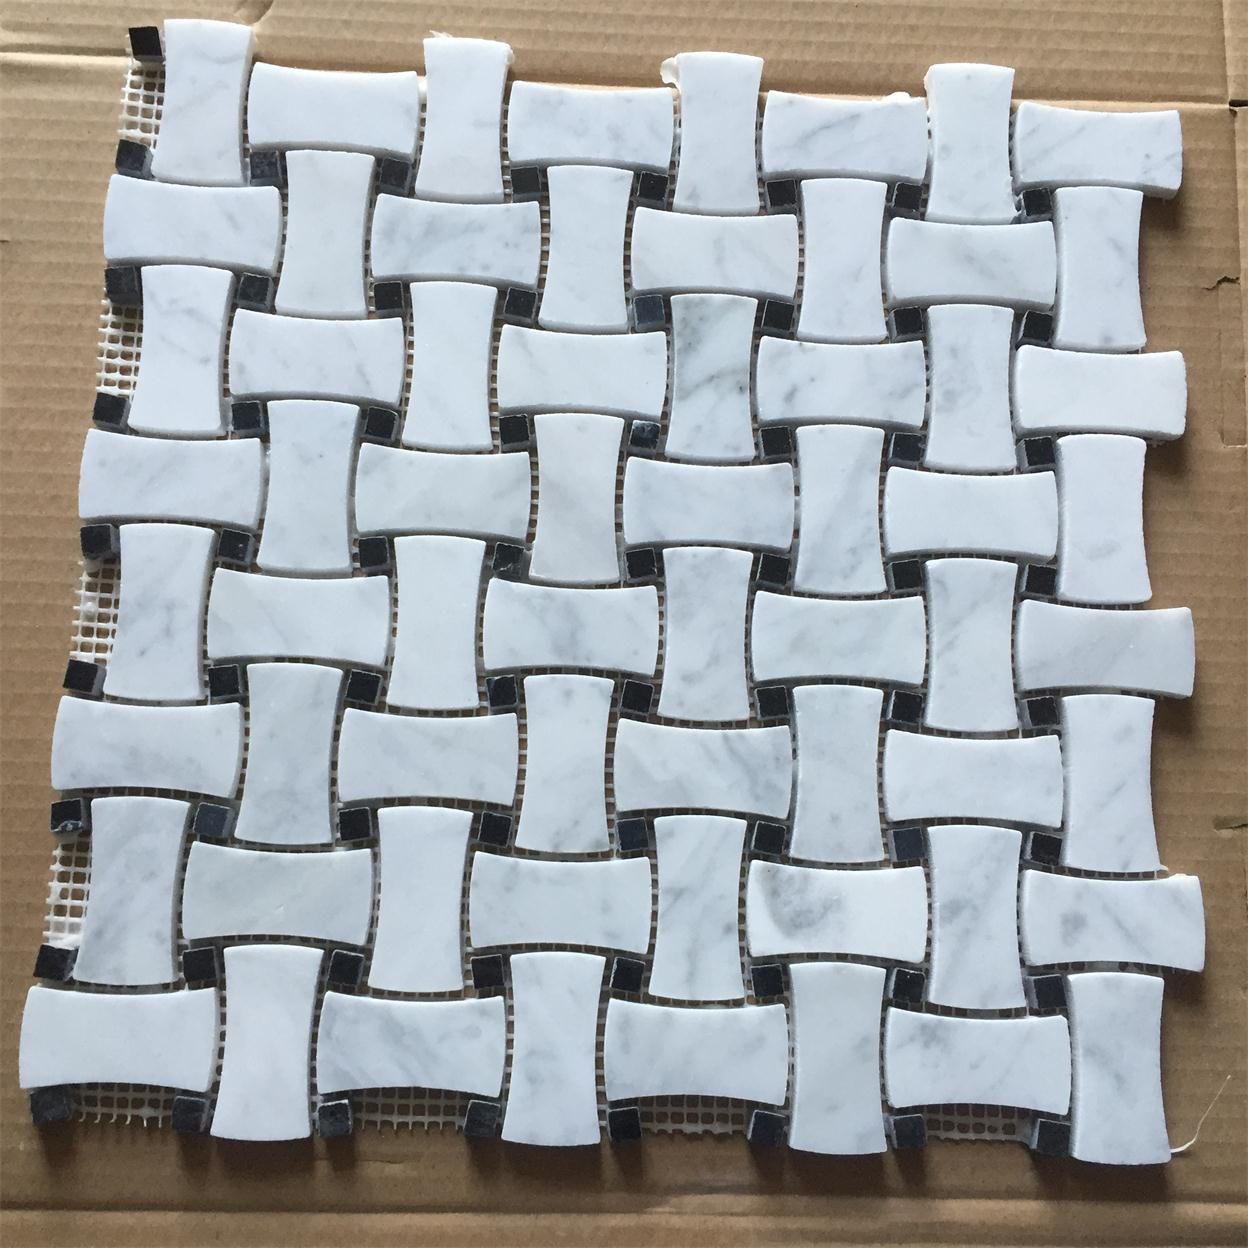 Bianco Carrara White Marble Mosaic for Bathroom Wall